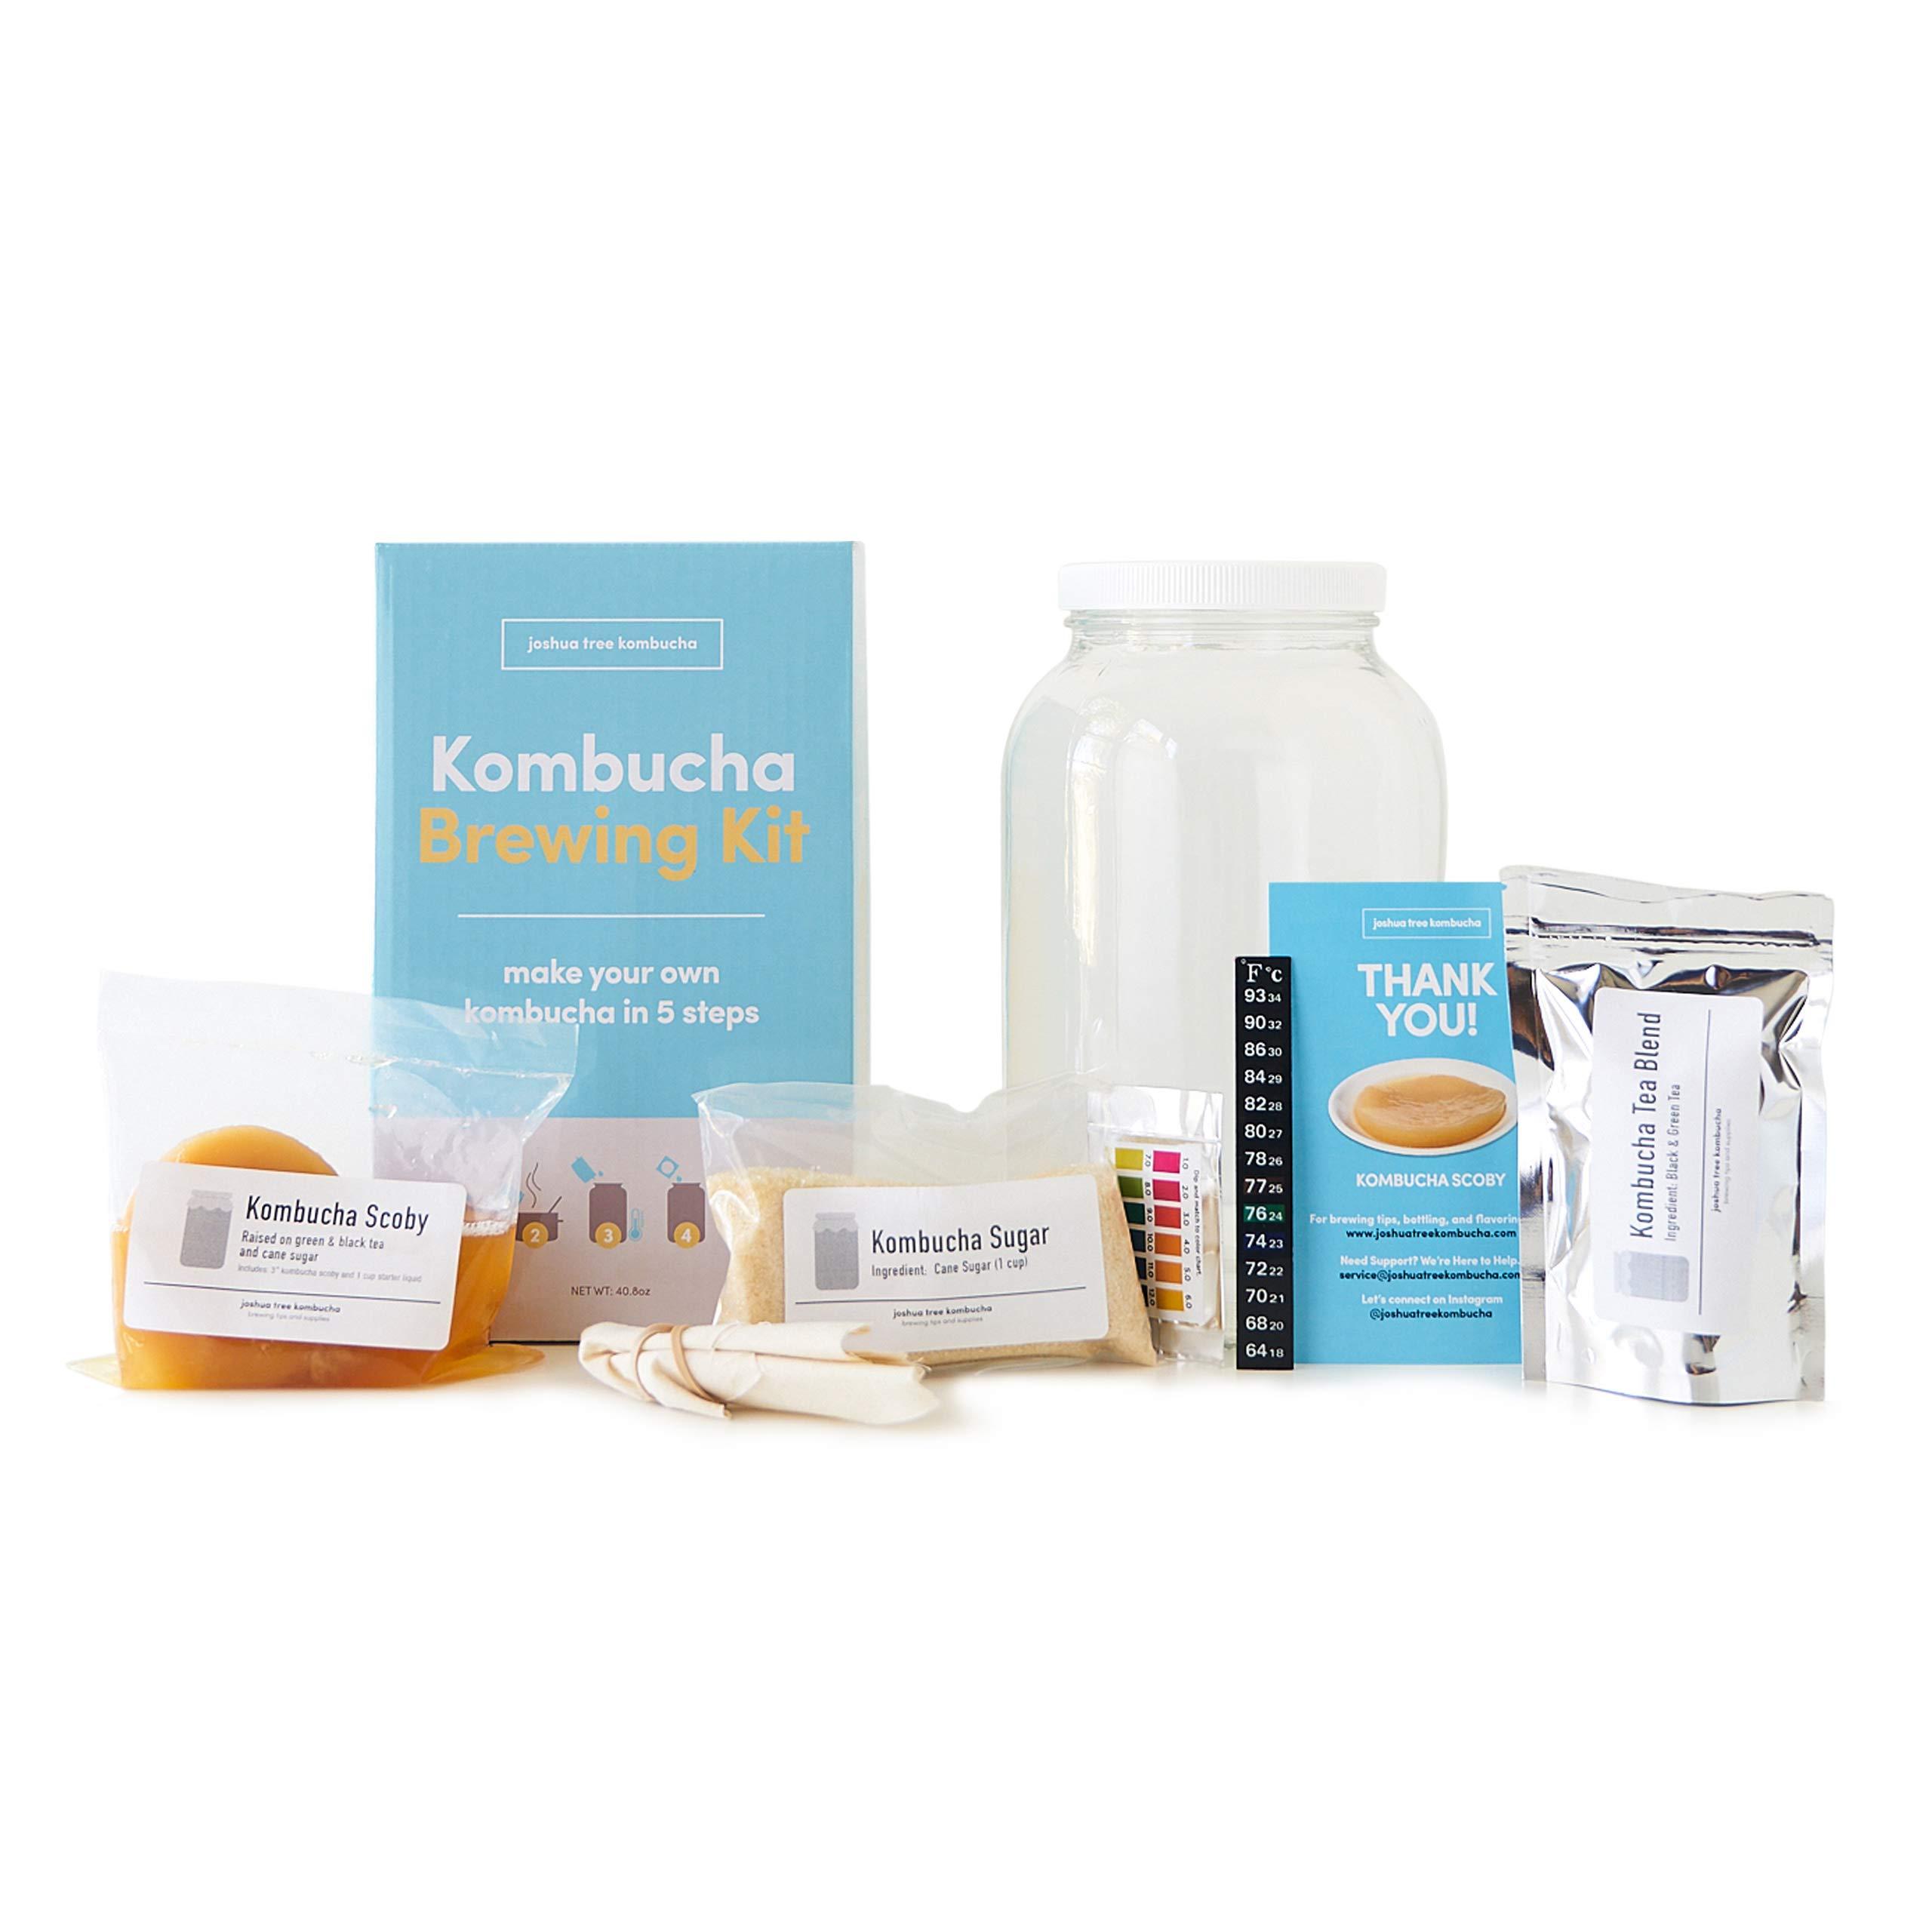 Kombucha Brewing Kit with Kombucha Scoby (Complete) by Joshua Tree Kombucha